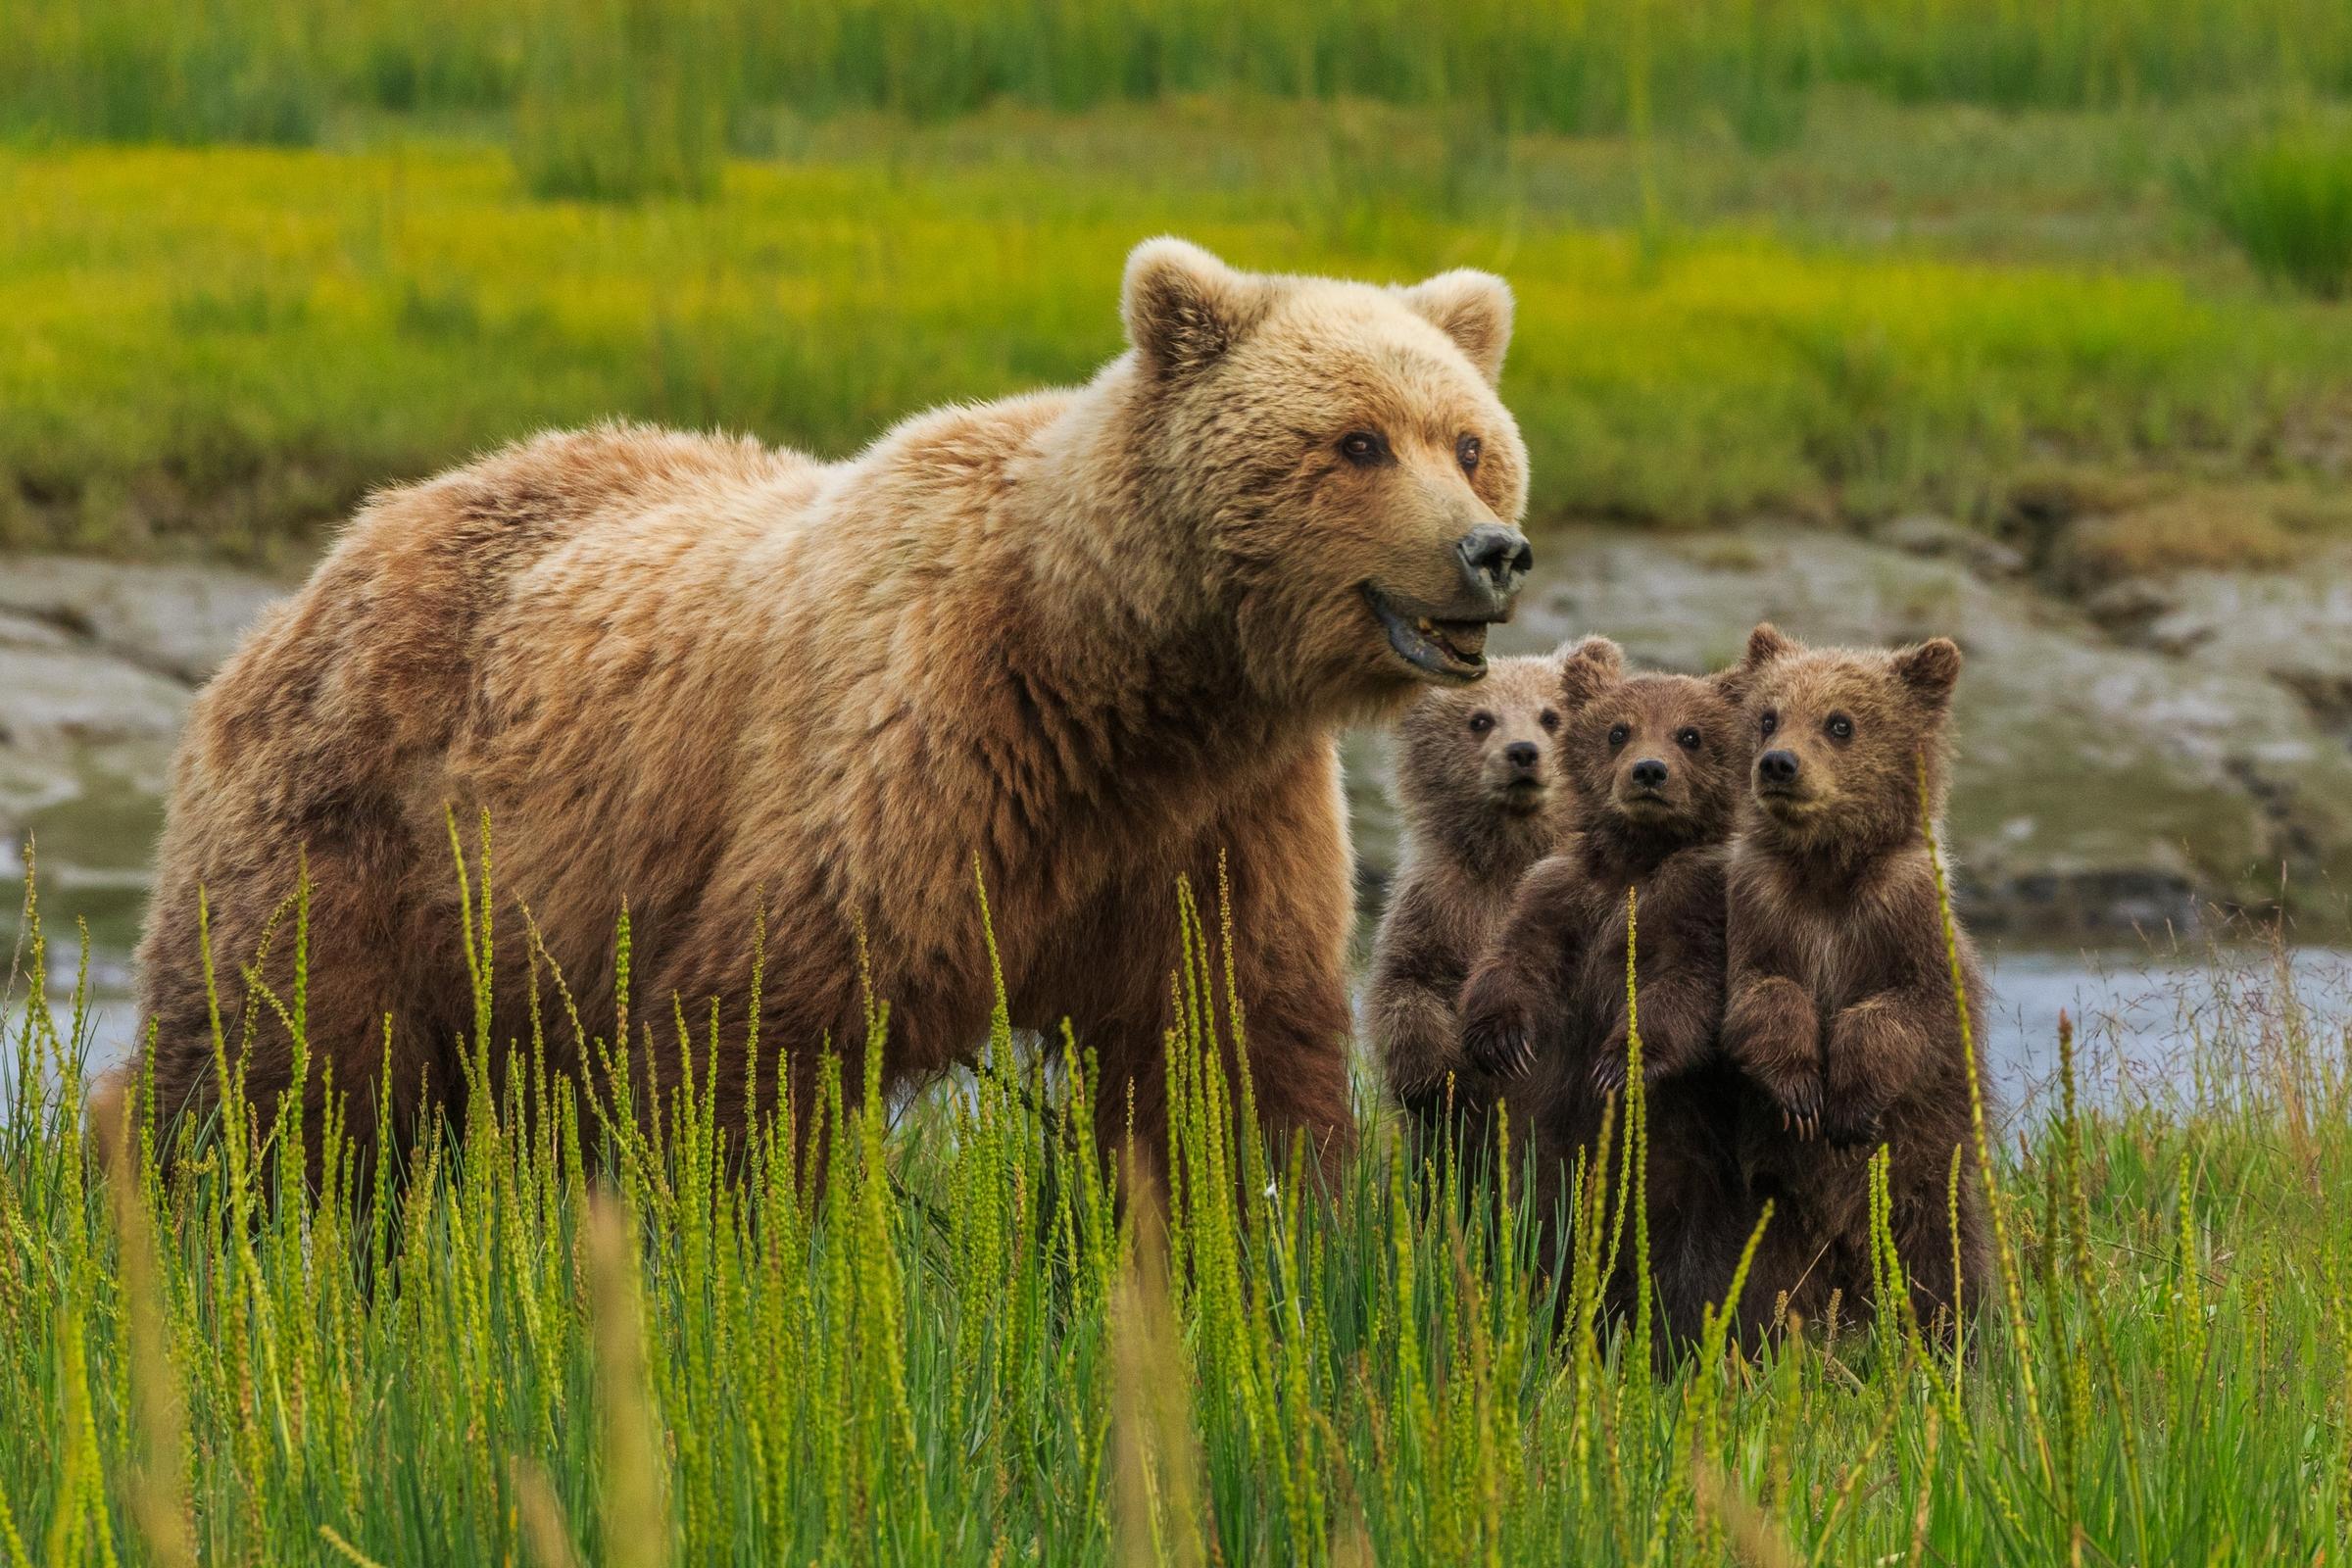 Cute Otter Wallpaper Brown Bears Lake Clark National Park Alaska Usa Art Wolfe